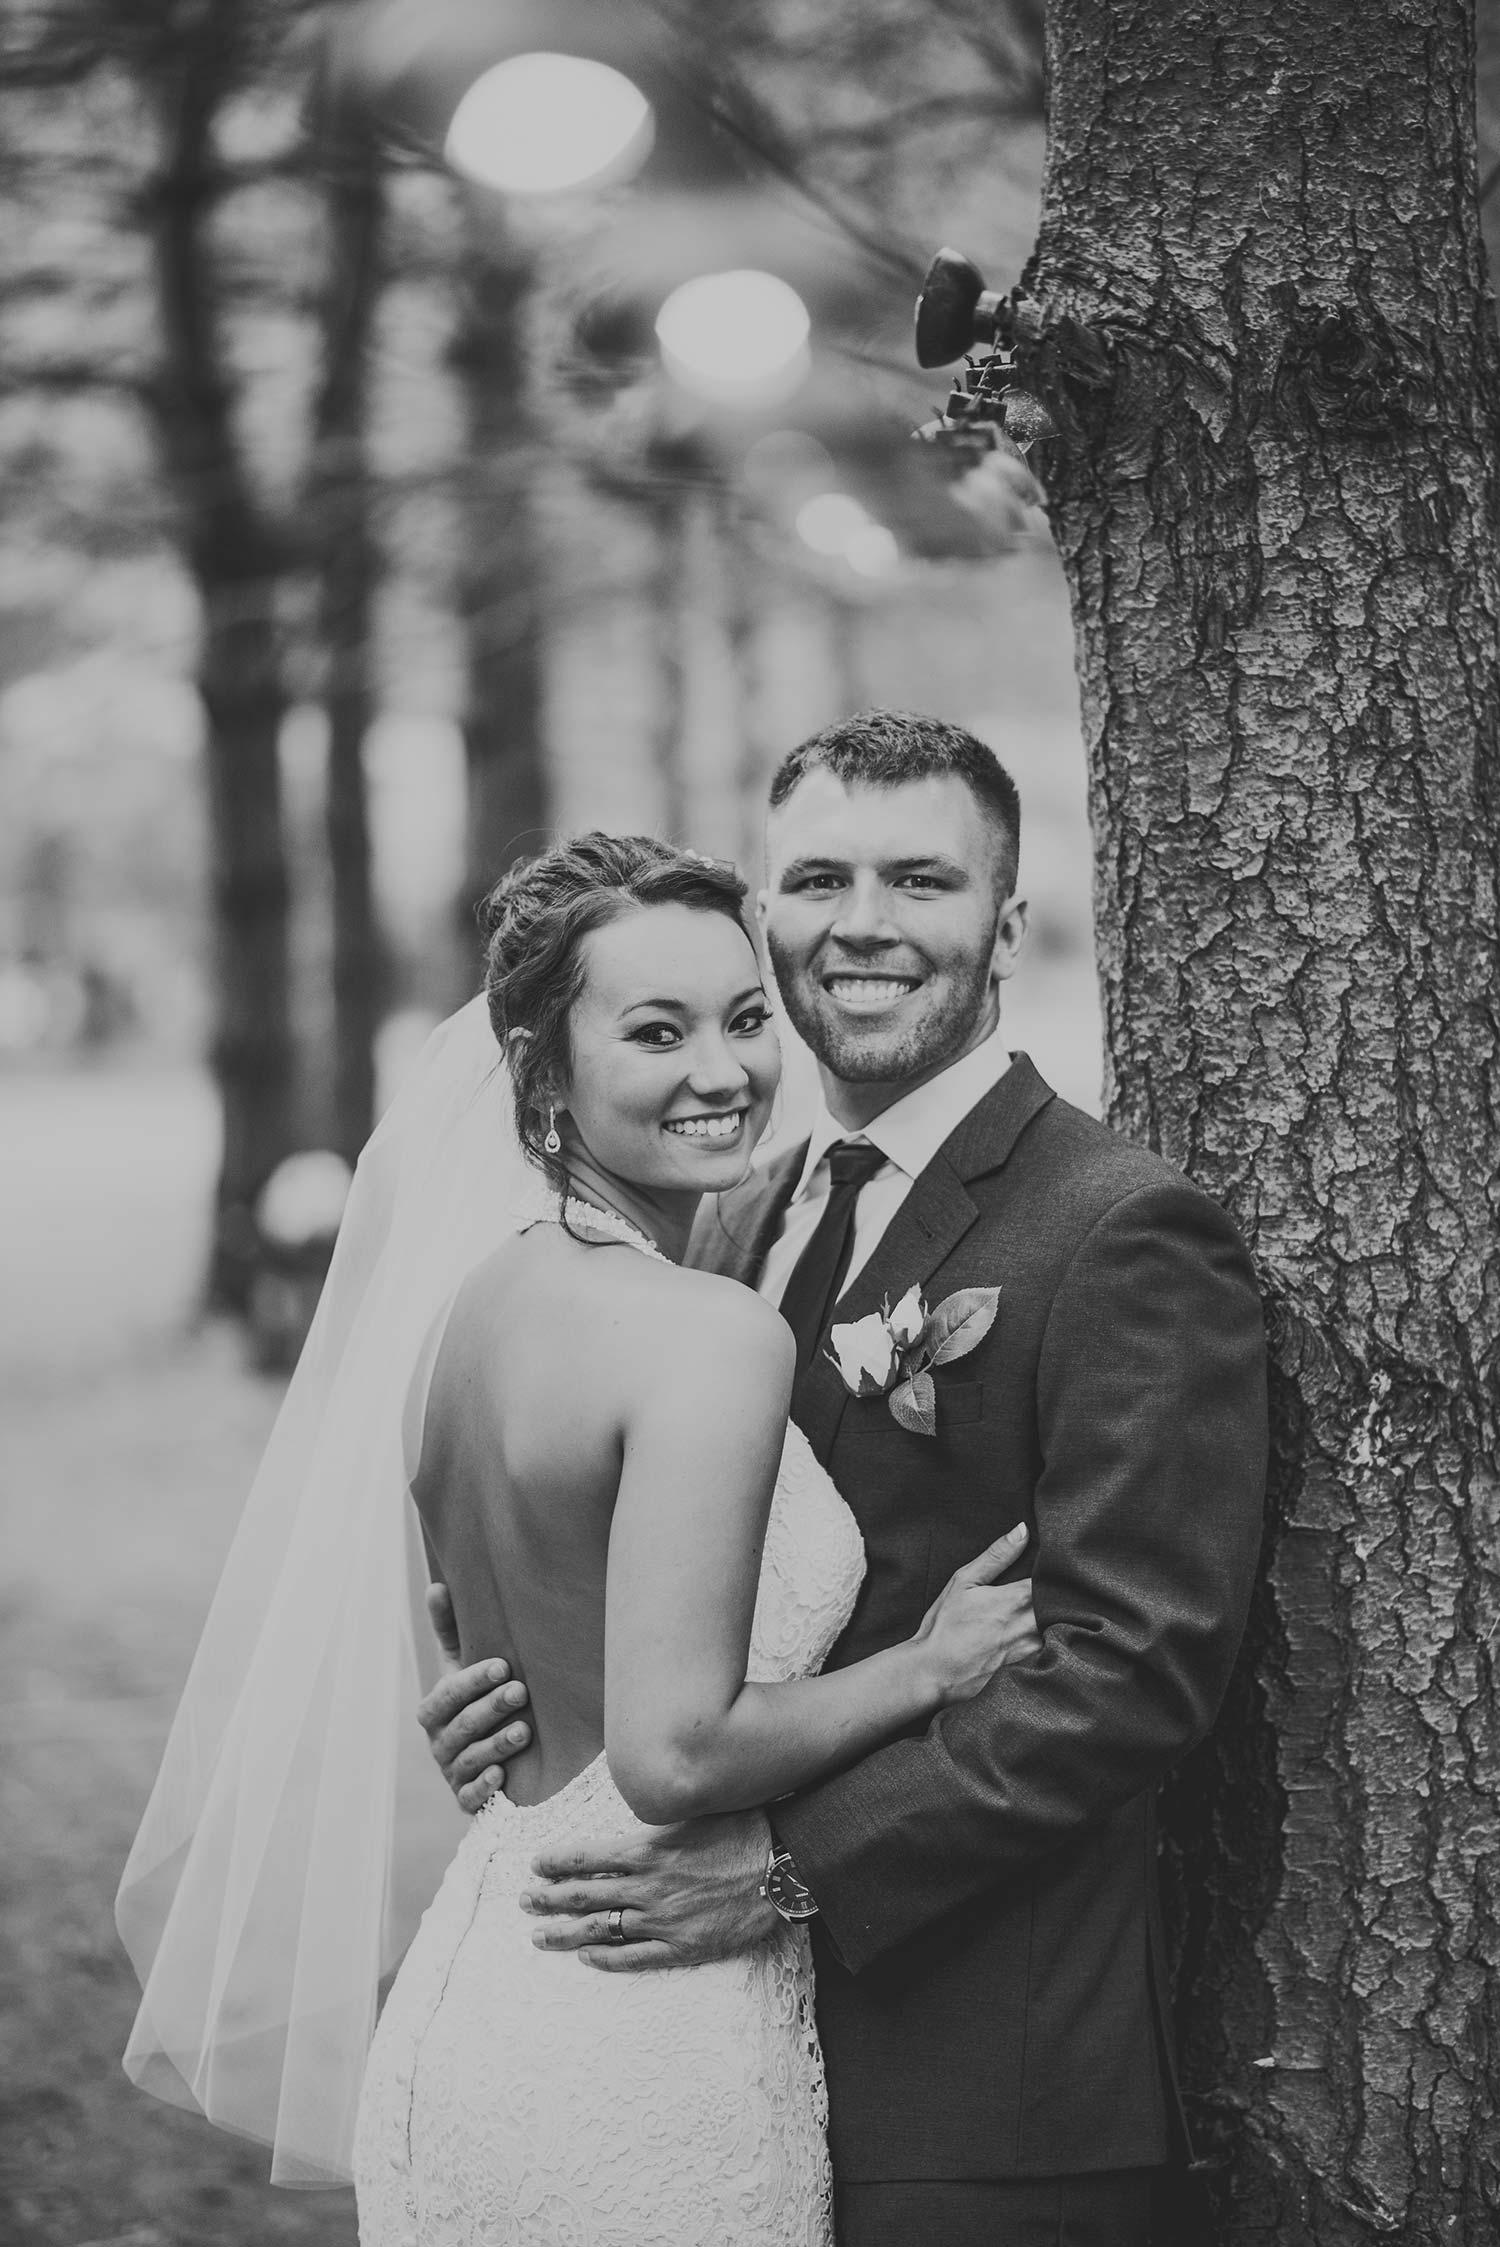 string-lights-forest-wedding-portrait.jpg